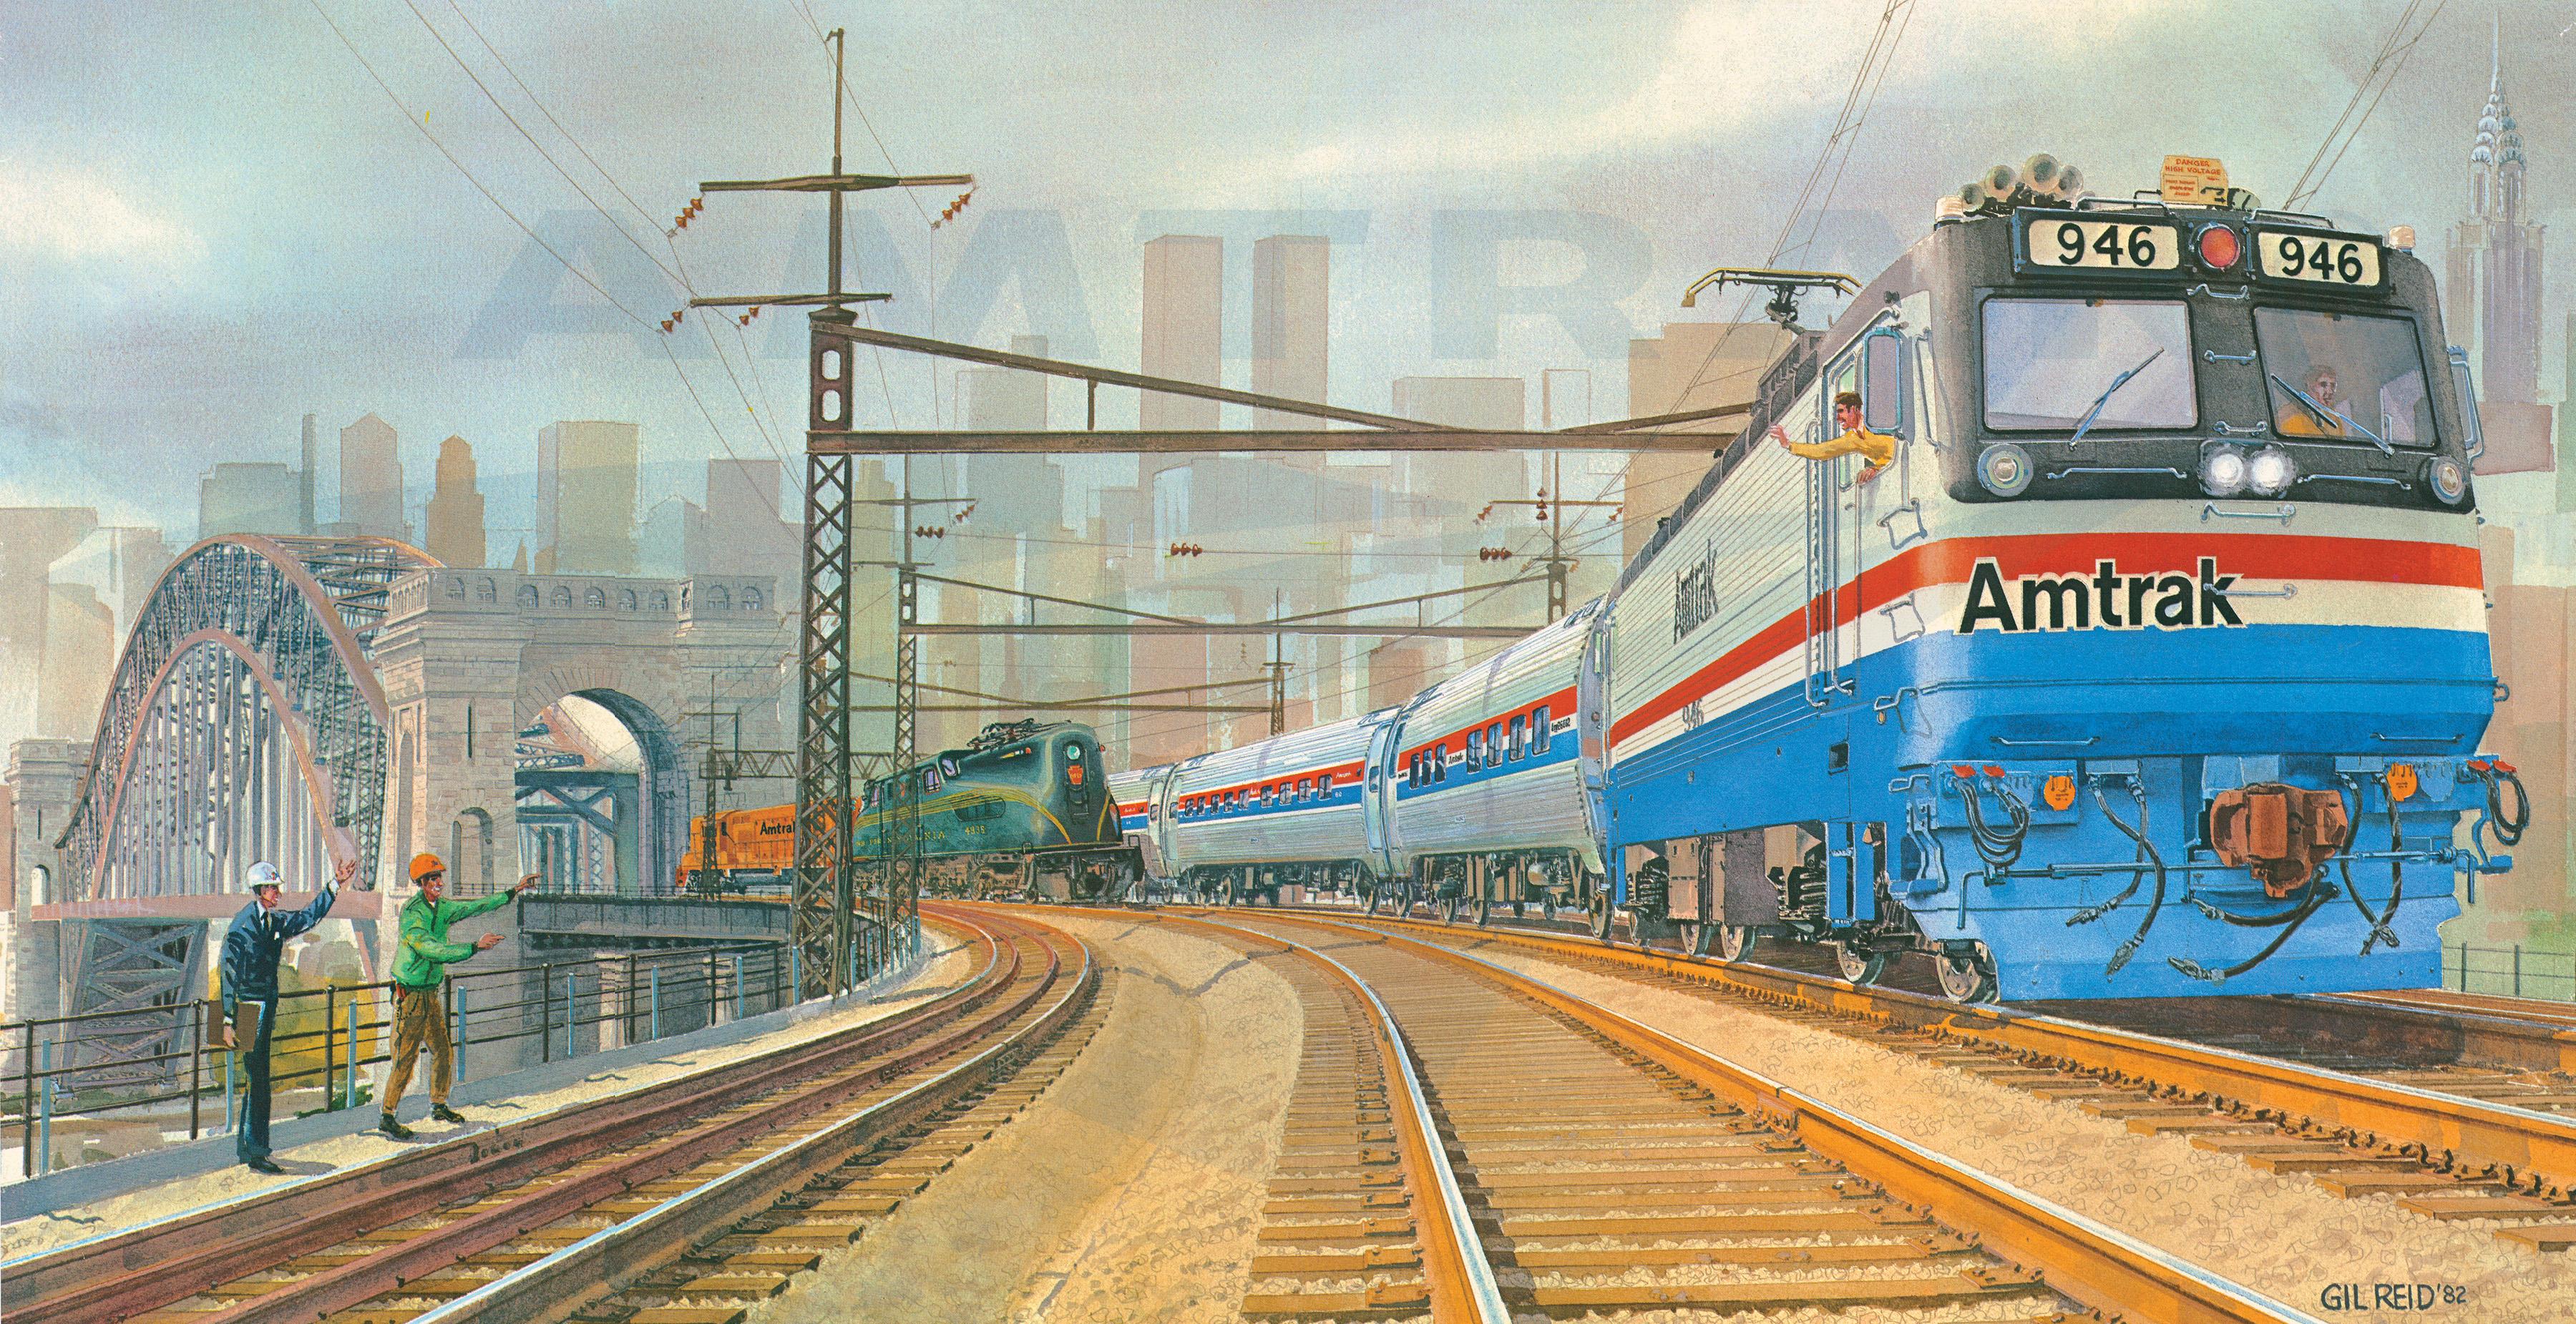 Train to colorado from pa - Amtrak Train In Autumn Landscape